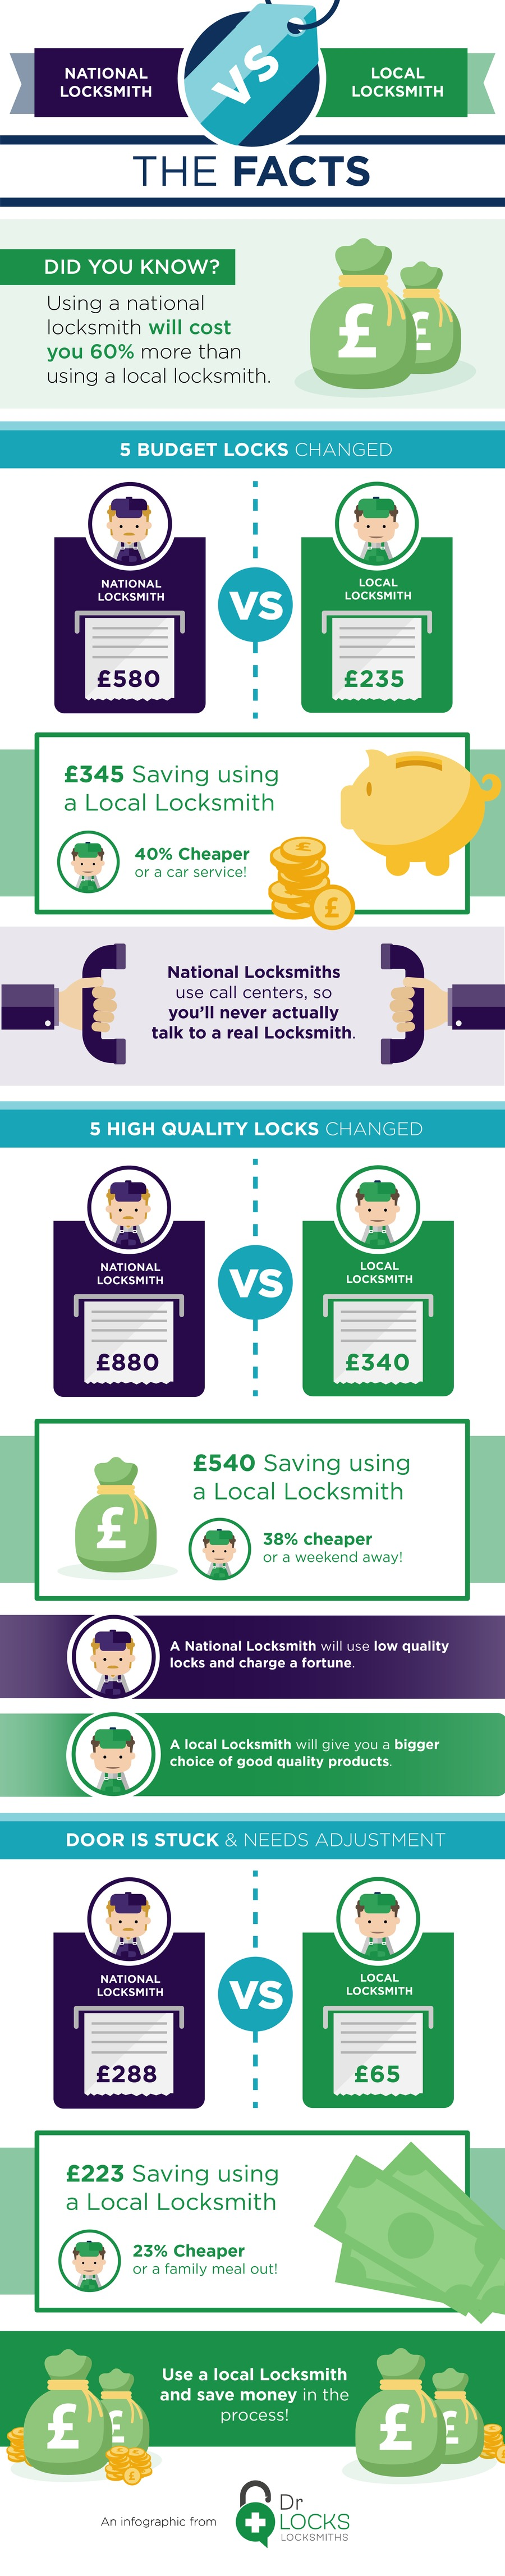 National Locksmith vs Local Locksmith: The Facts by Dr Locks